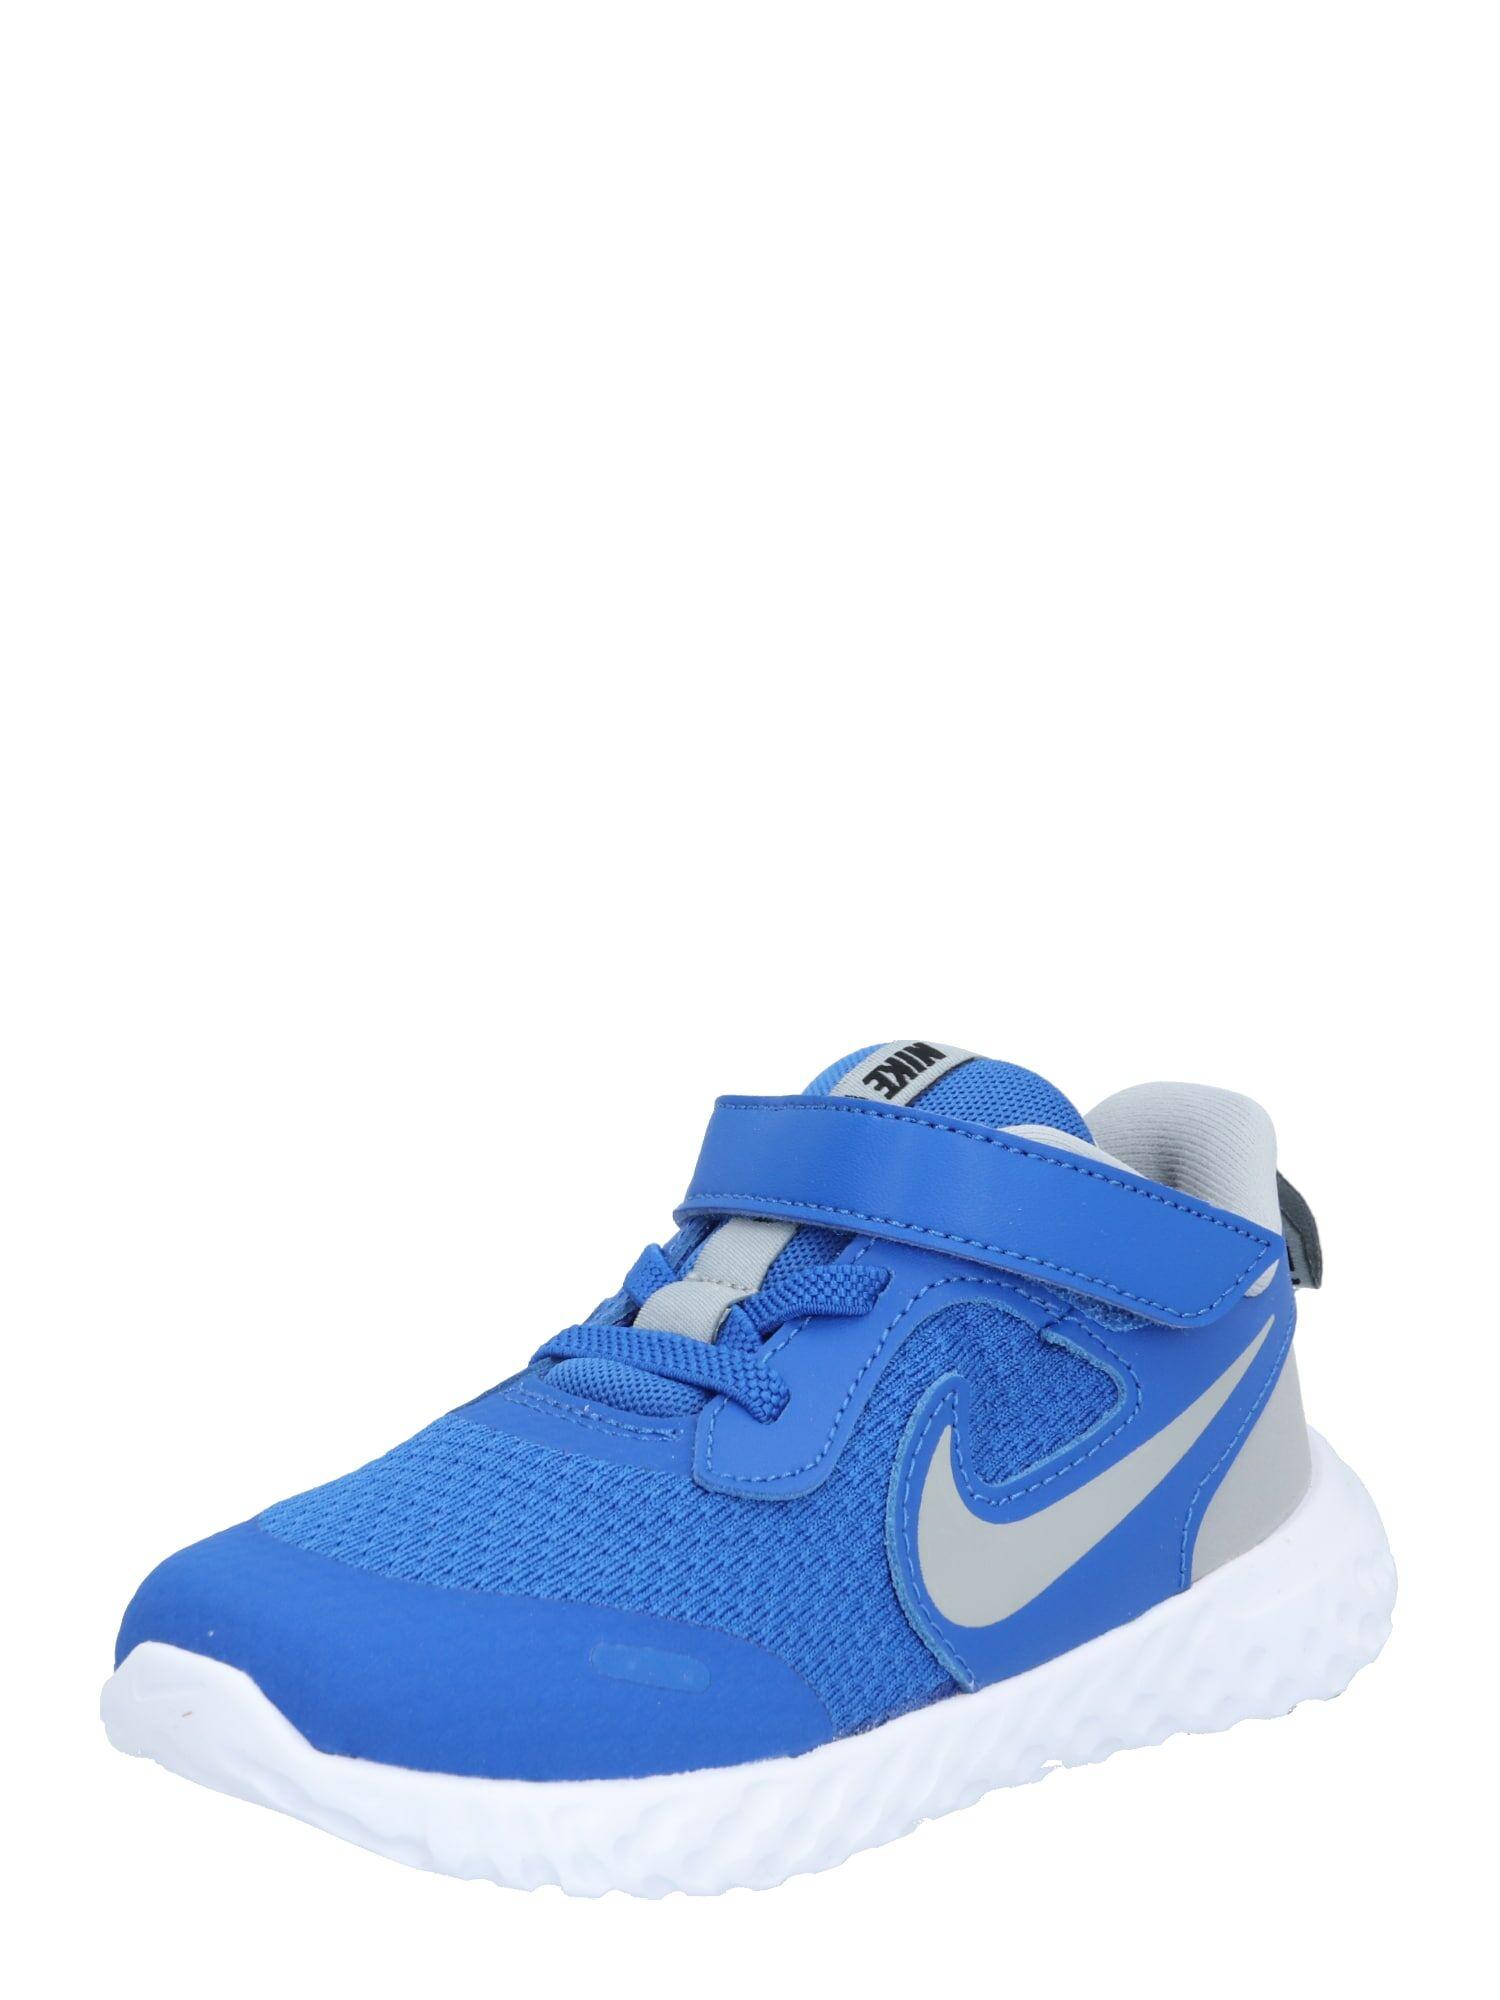 NIKE Chaussure de sport 'Nike Revolution 5'  - Bleu - Taille: 5C - boy